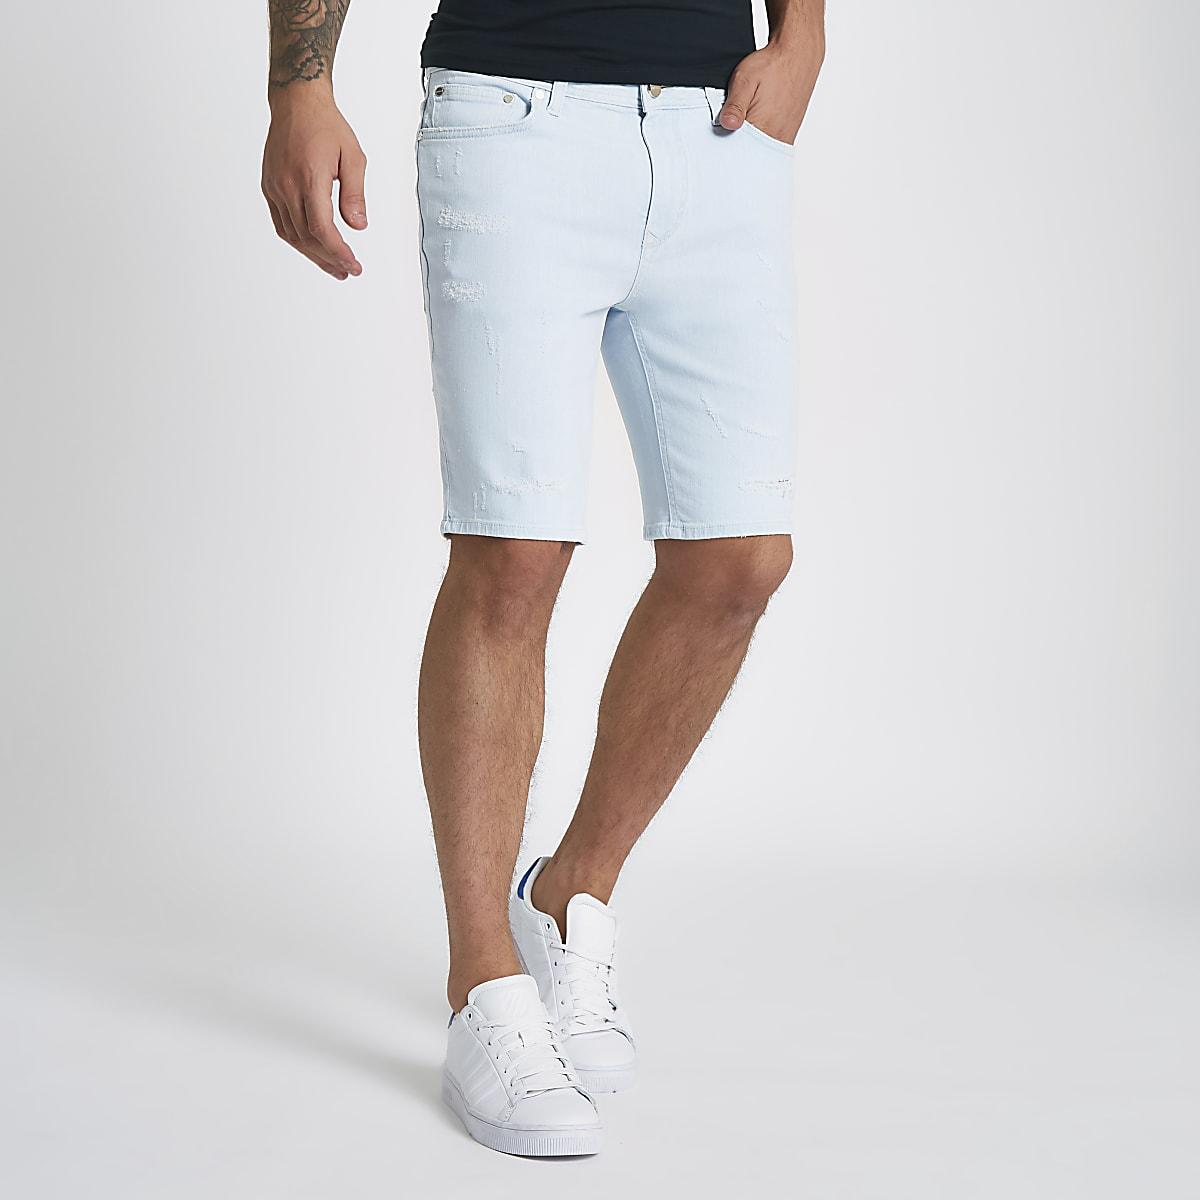 Light blue skinny ripped denim shorts